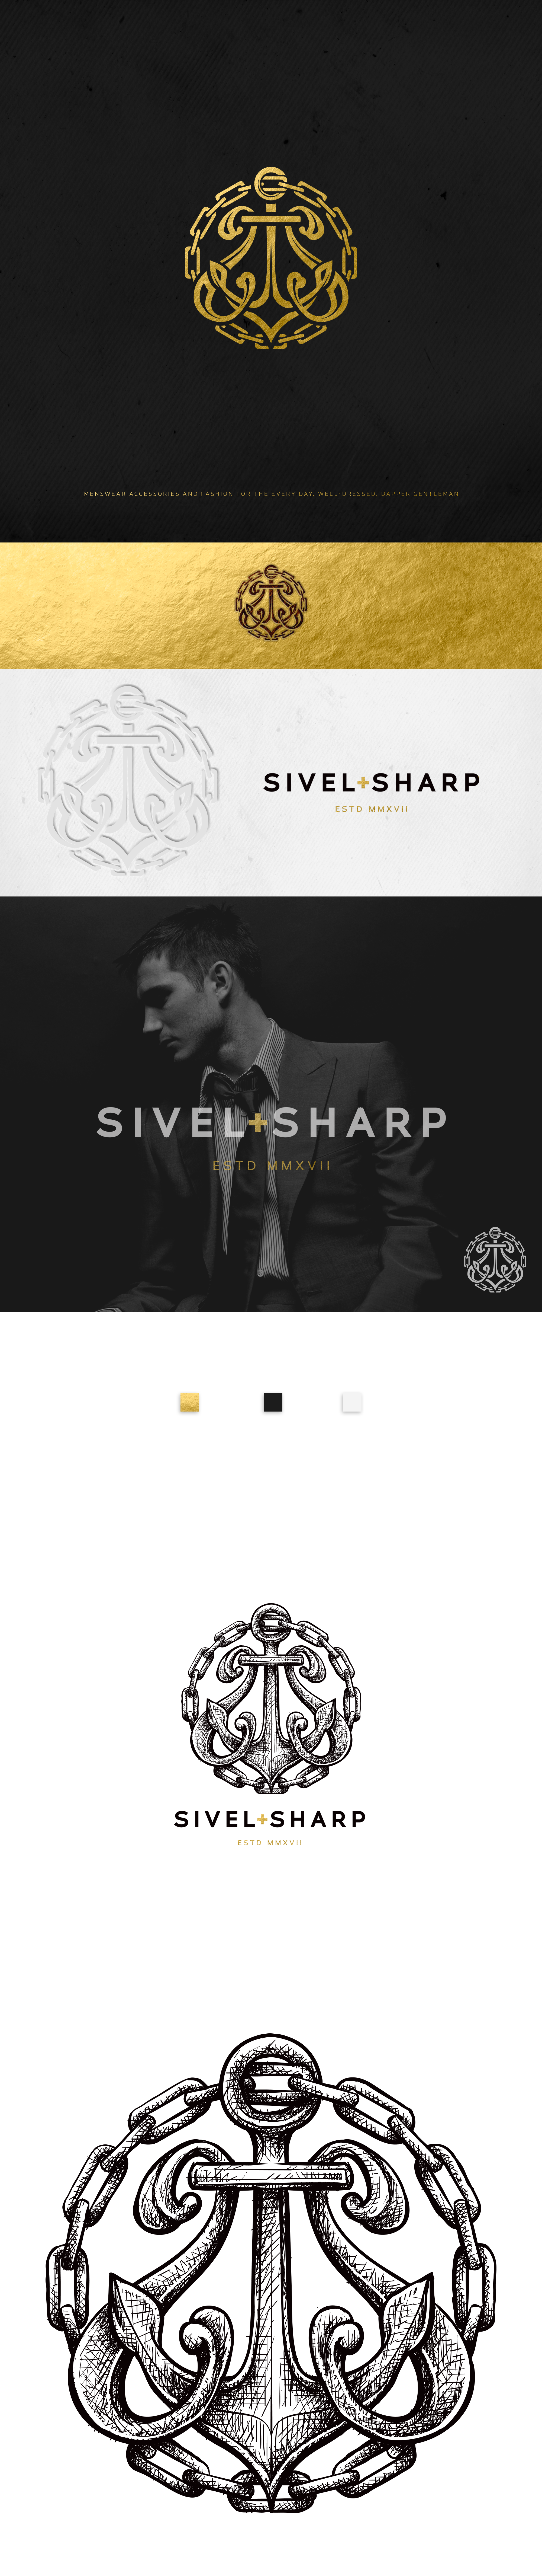 Help rebrand a Men's Accessories/Fashion Co. -  SIVEL + SHARP